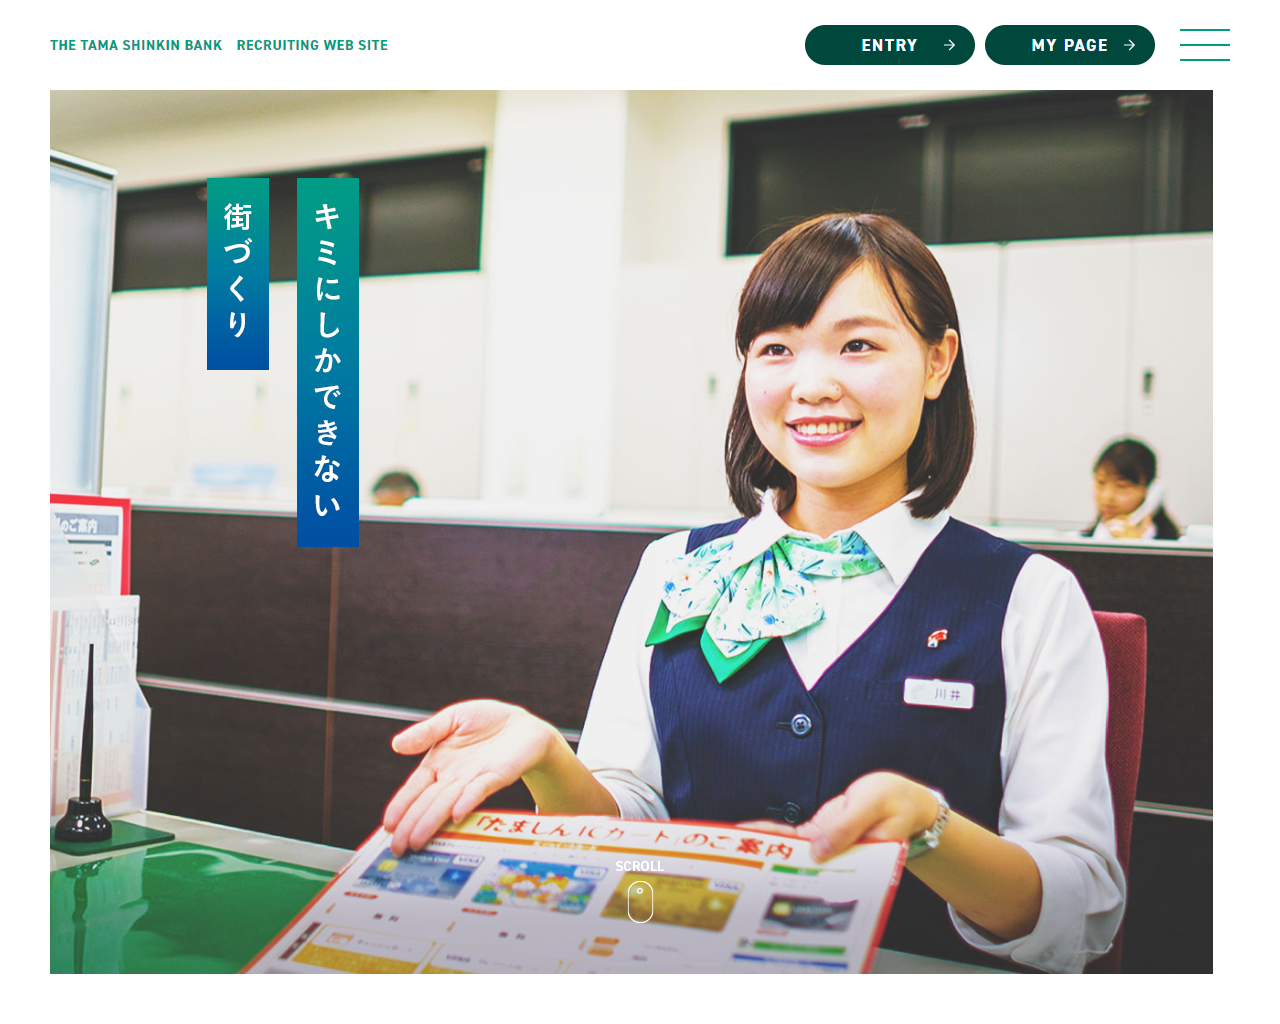 THE TAMA SHINKIN BANK RECRUITING WEB SITE PC画像